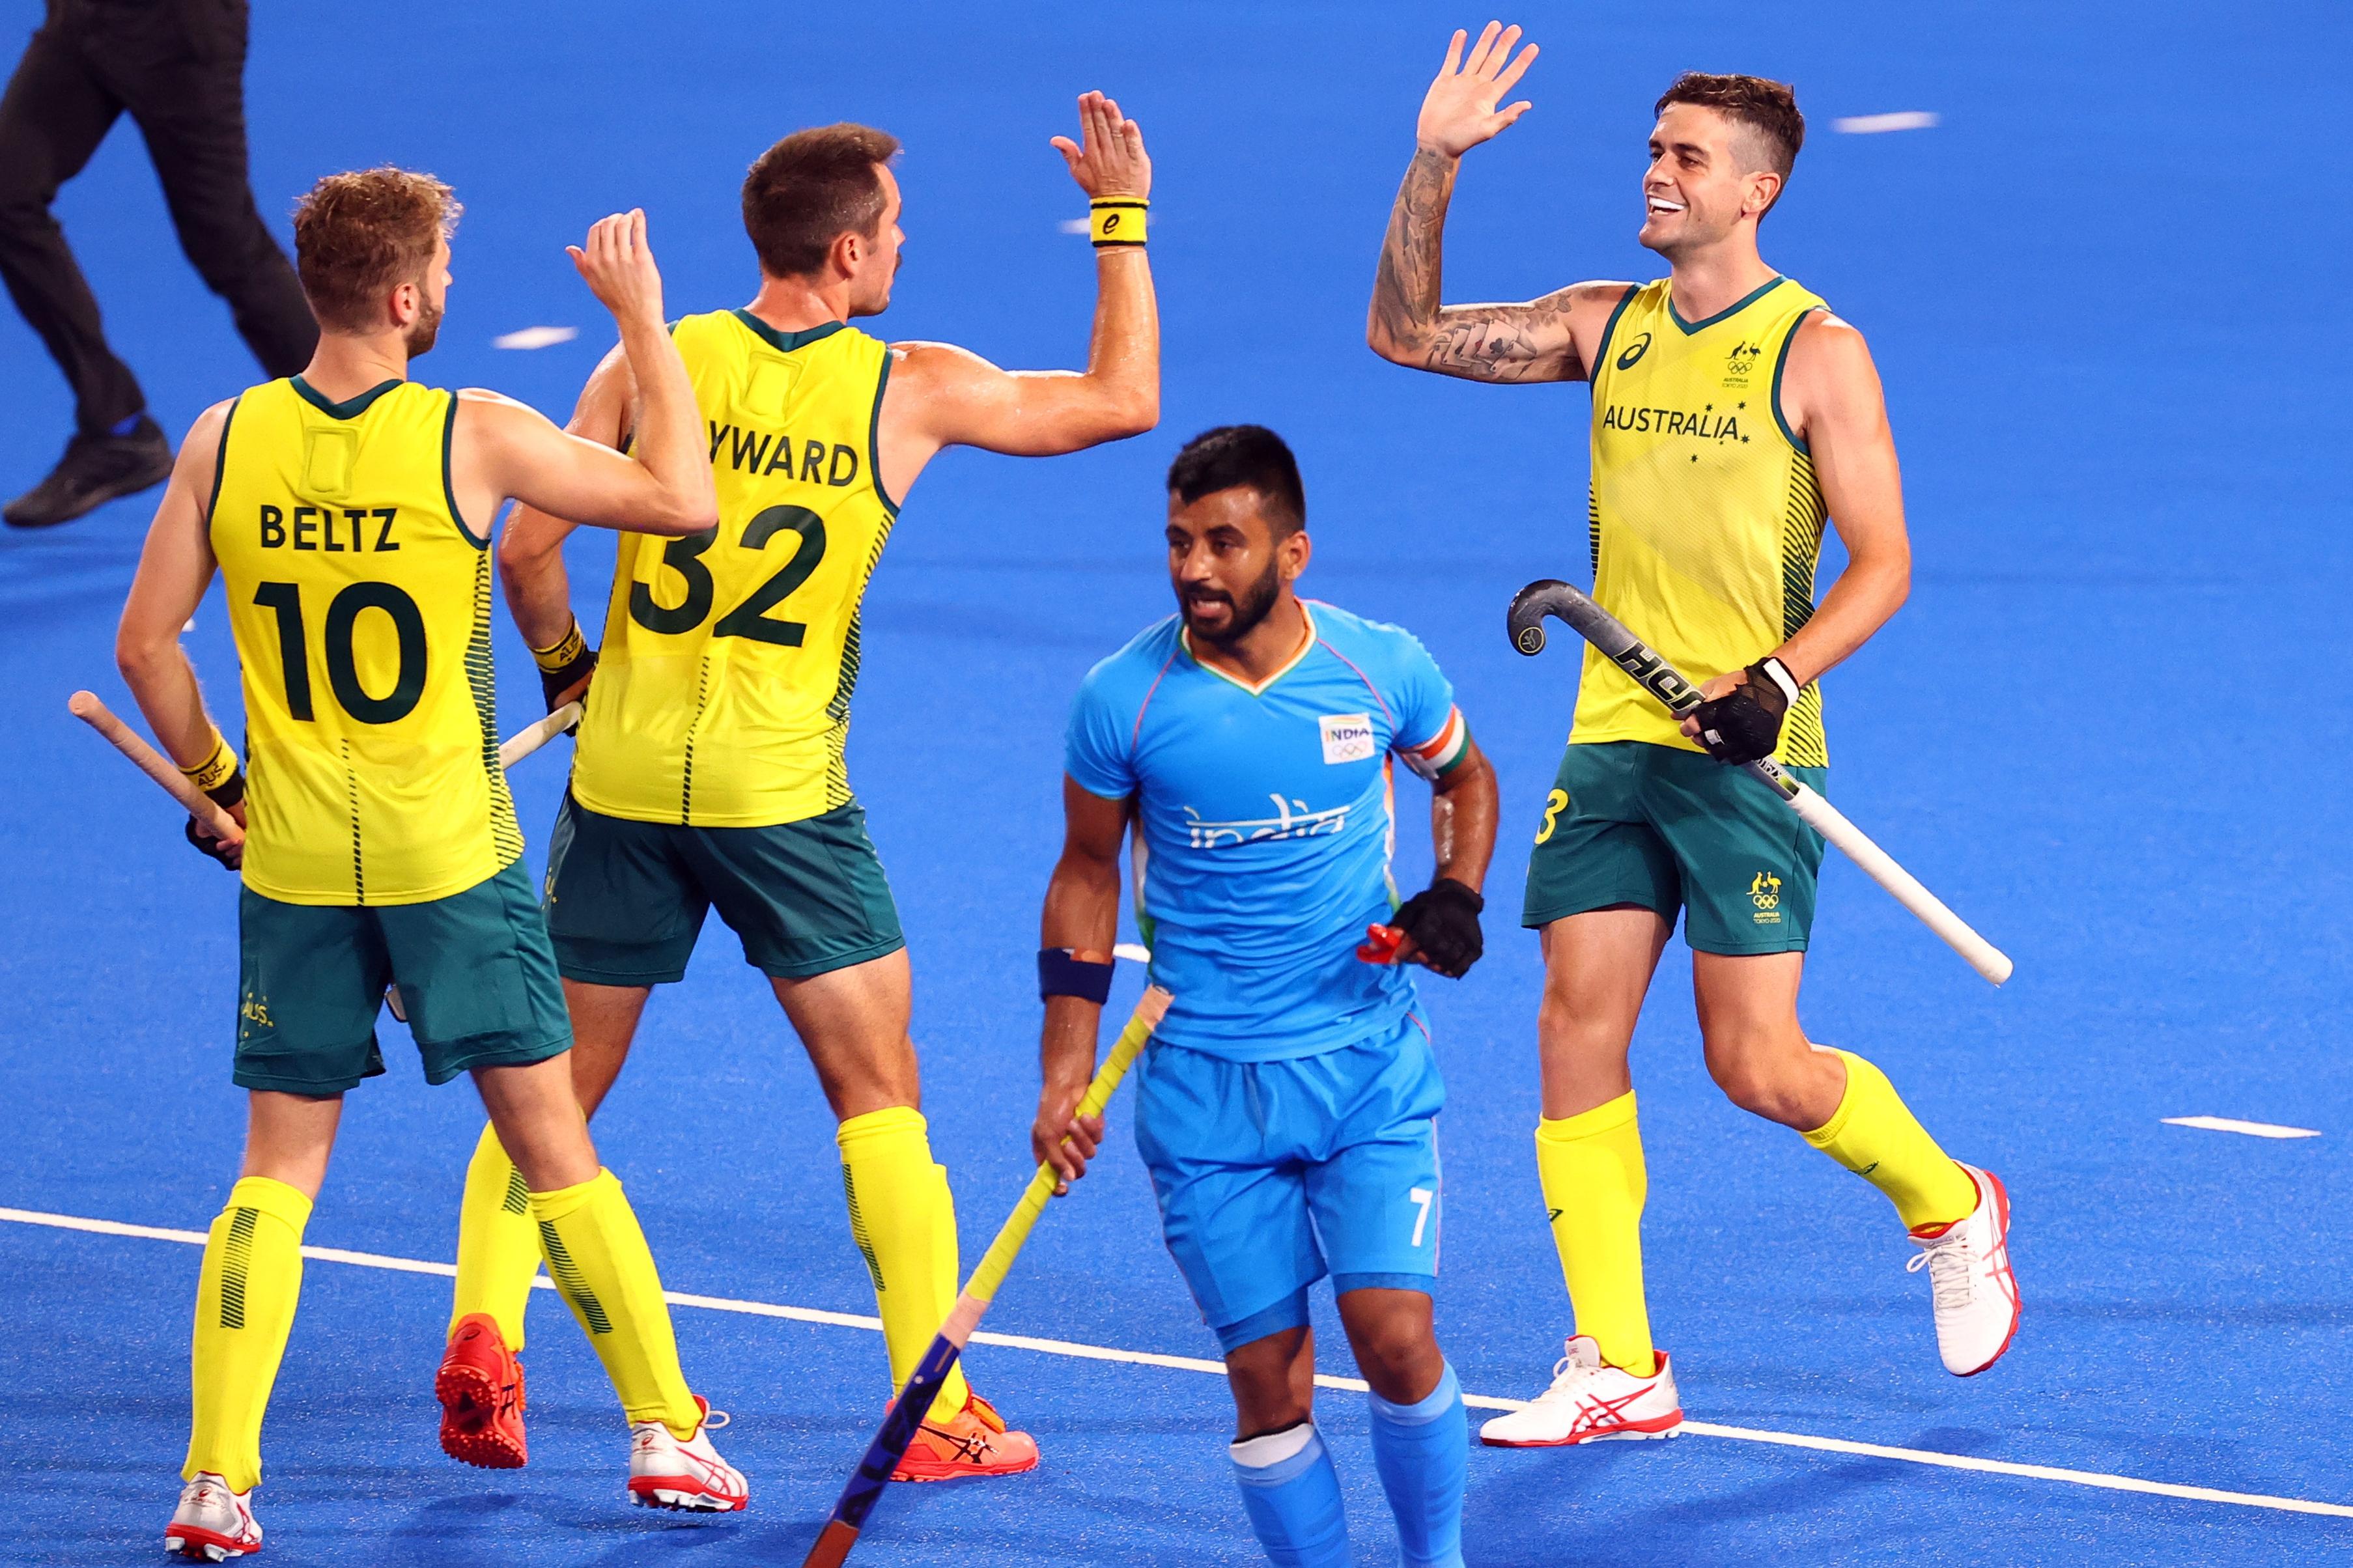 Tokyo 2020 Olympics - Hockey - Men's Pool A - India v Australia - Oi Hockey Stadium, Tokyo, Japan - July 25, 2021.  Players of Australia celebrate their goal. REUTERS/Bernadett Szabo